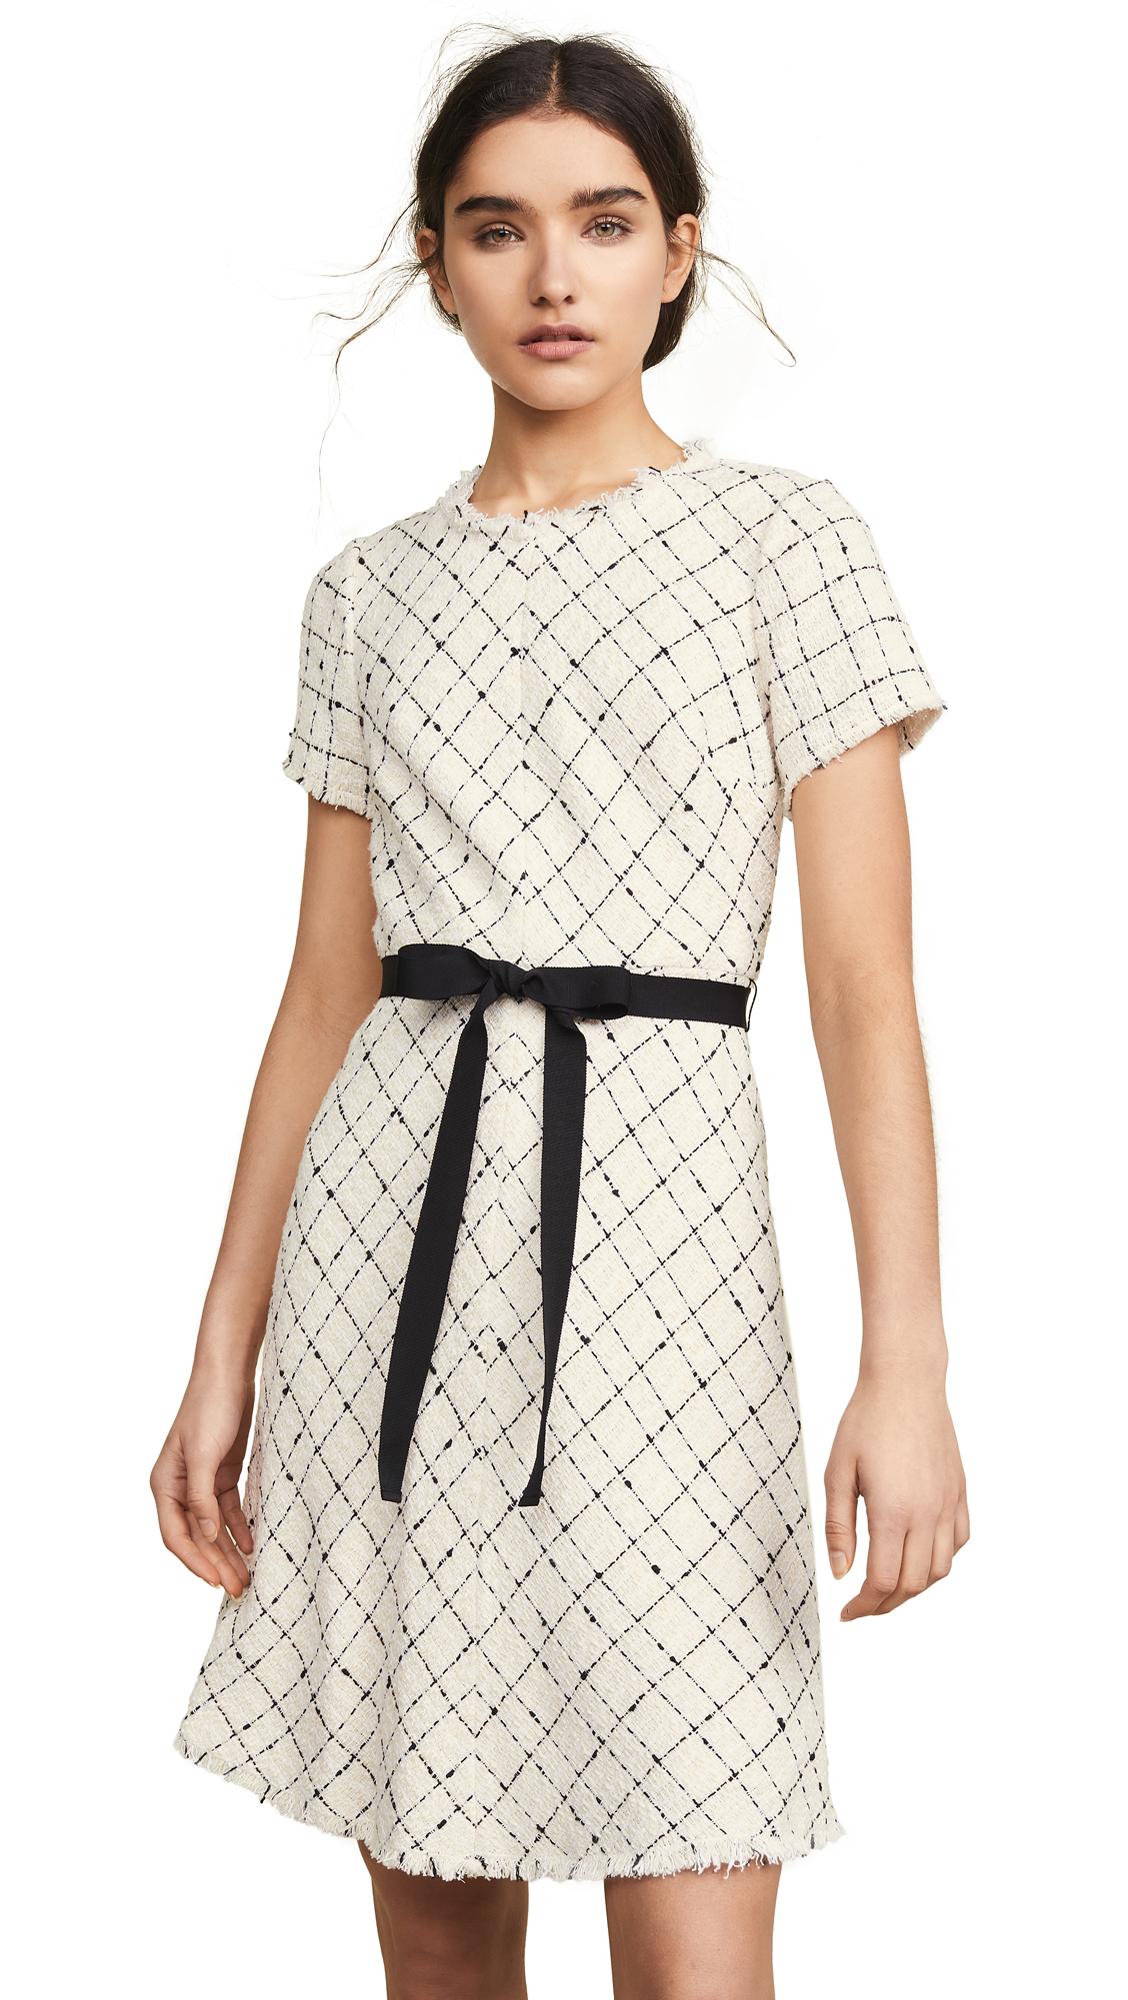 Rebecca Taylor Short Sleeve Plaid Tweed Dress - Cream Combo